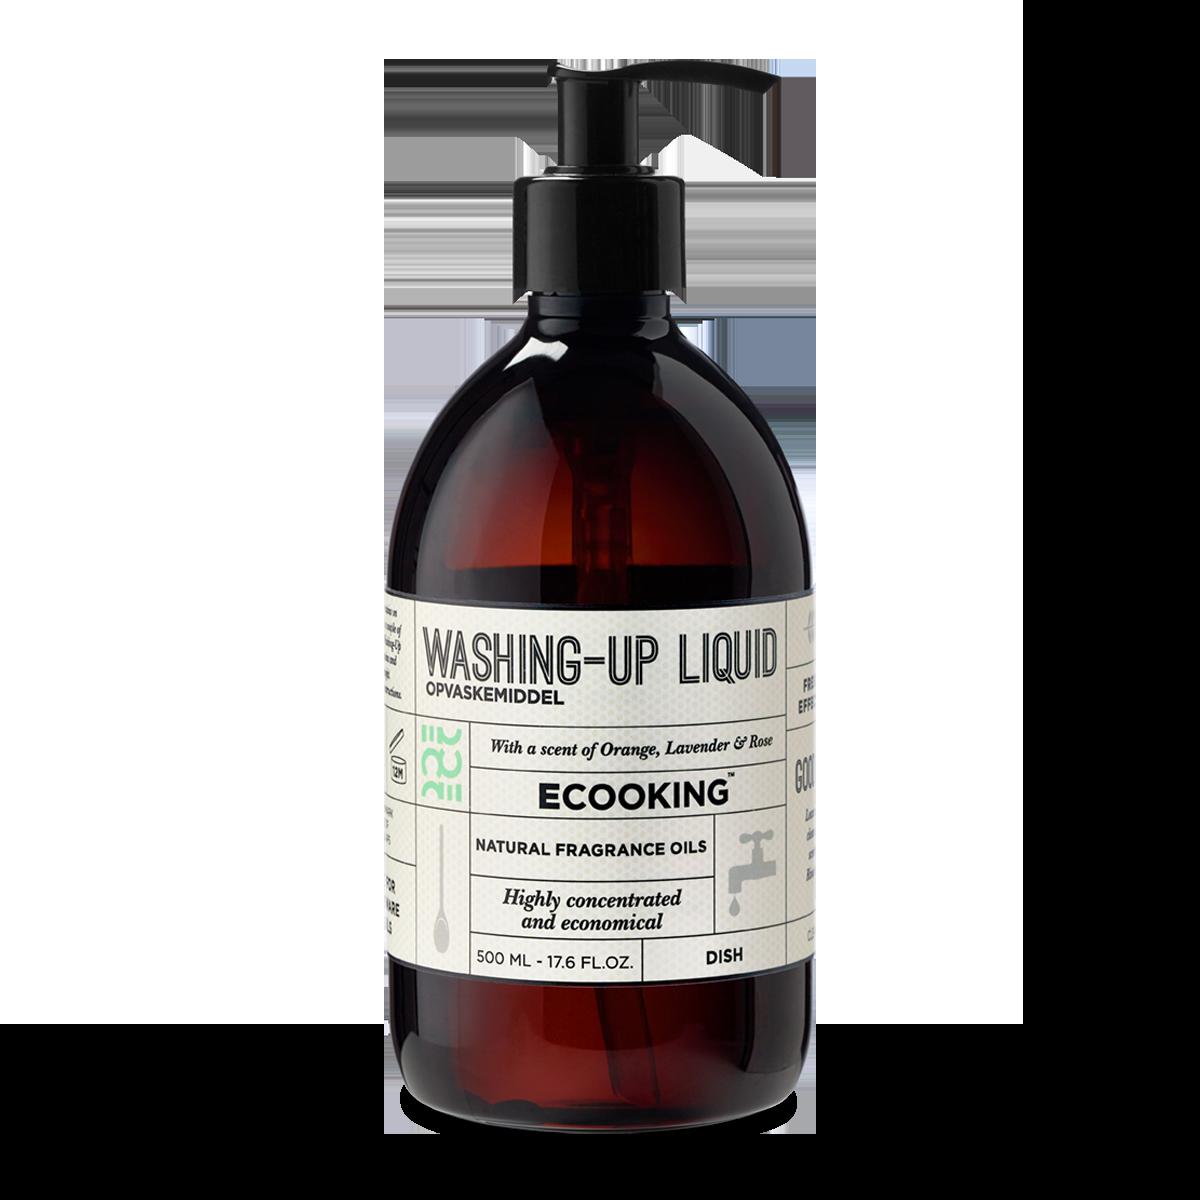 1200x1200_Washing_Up_Liquid_500ml